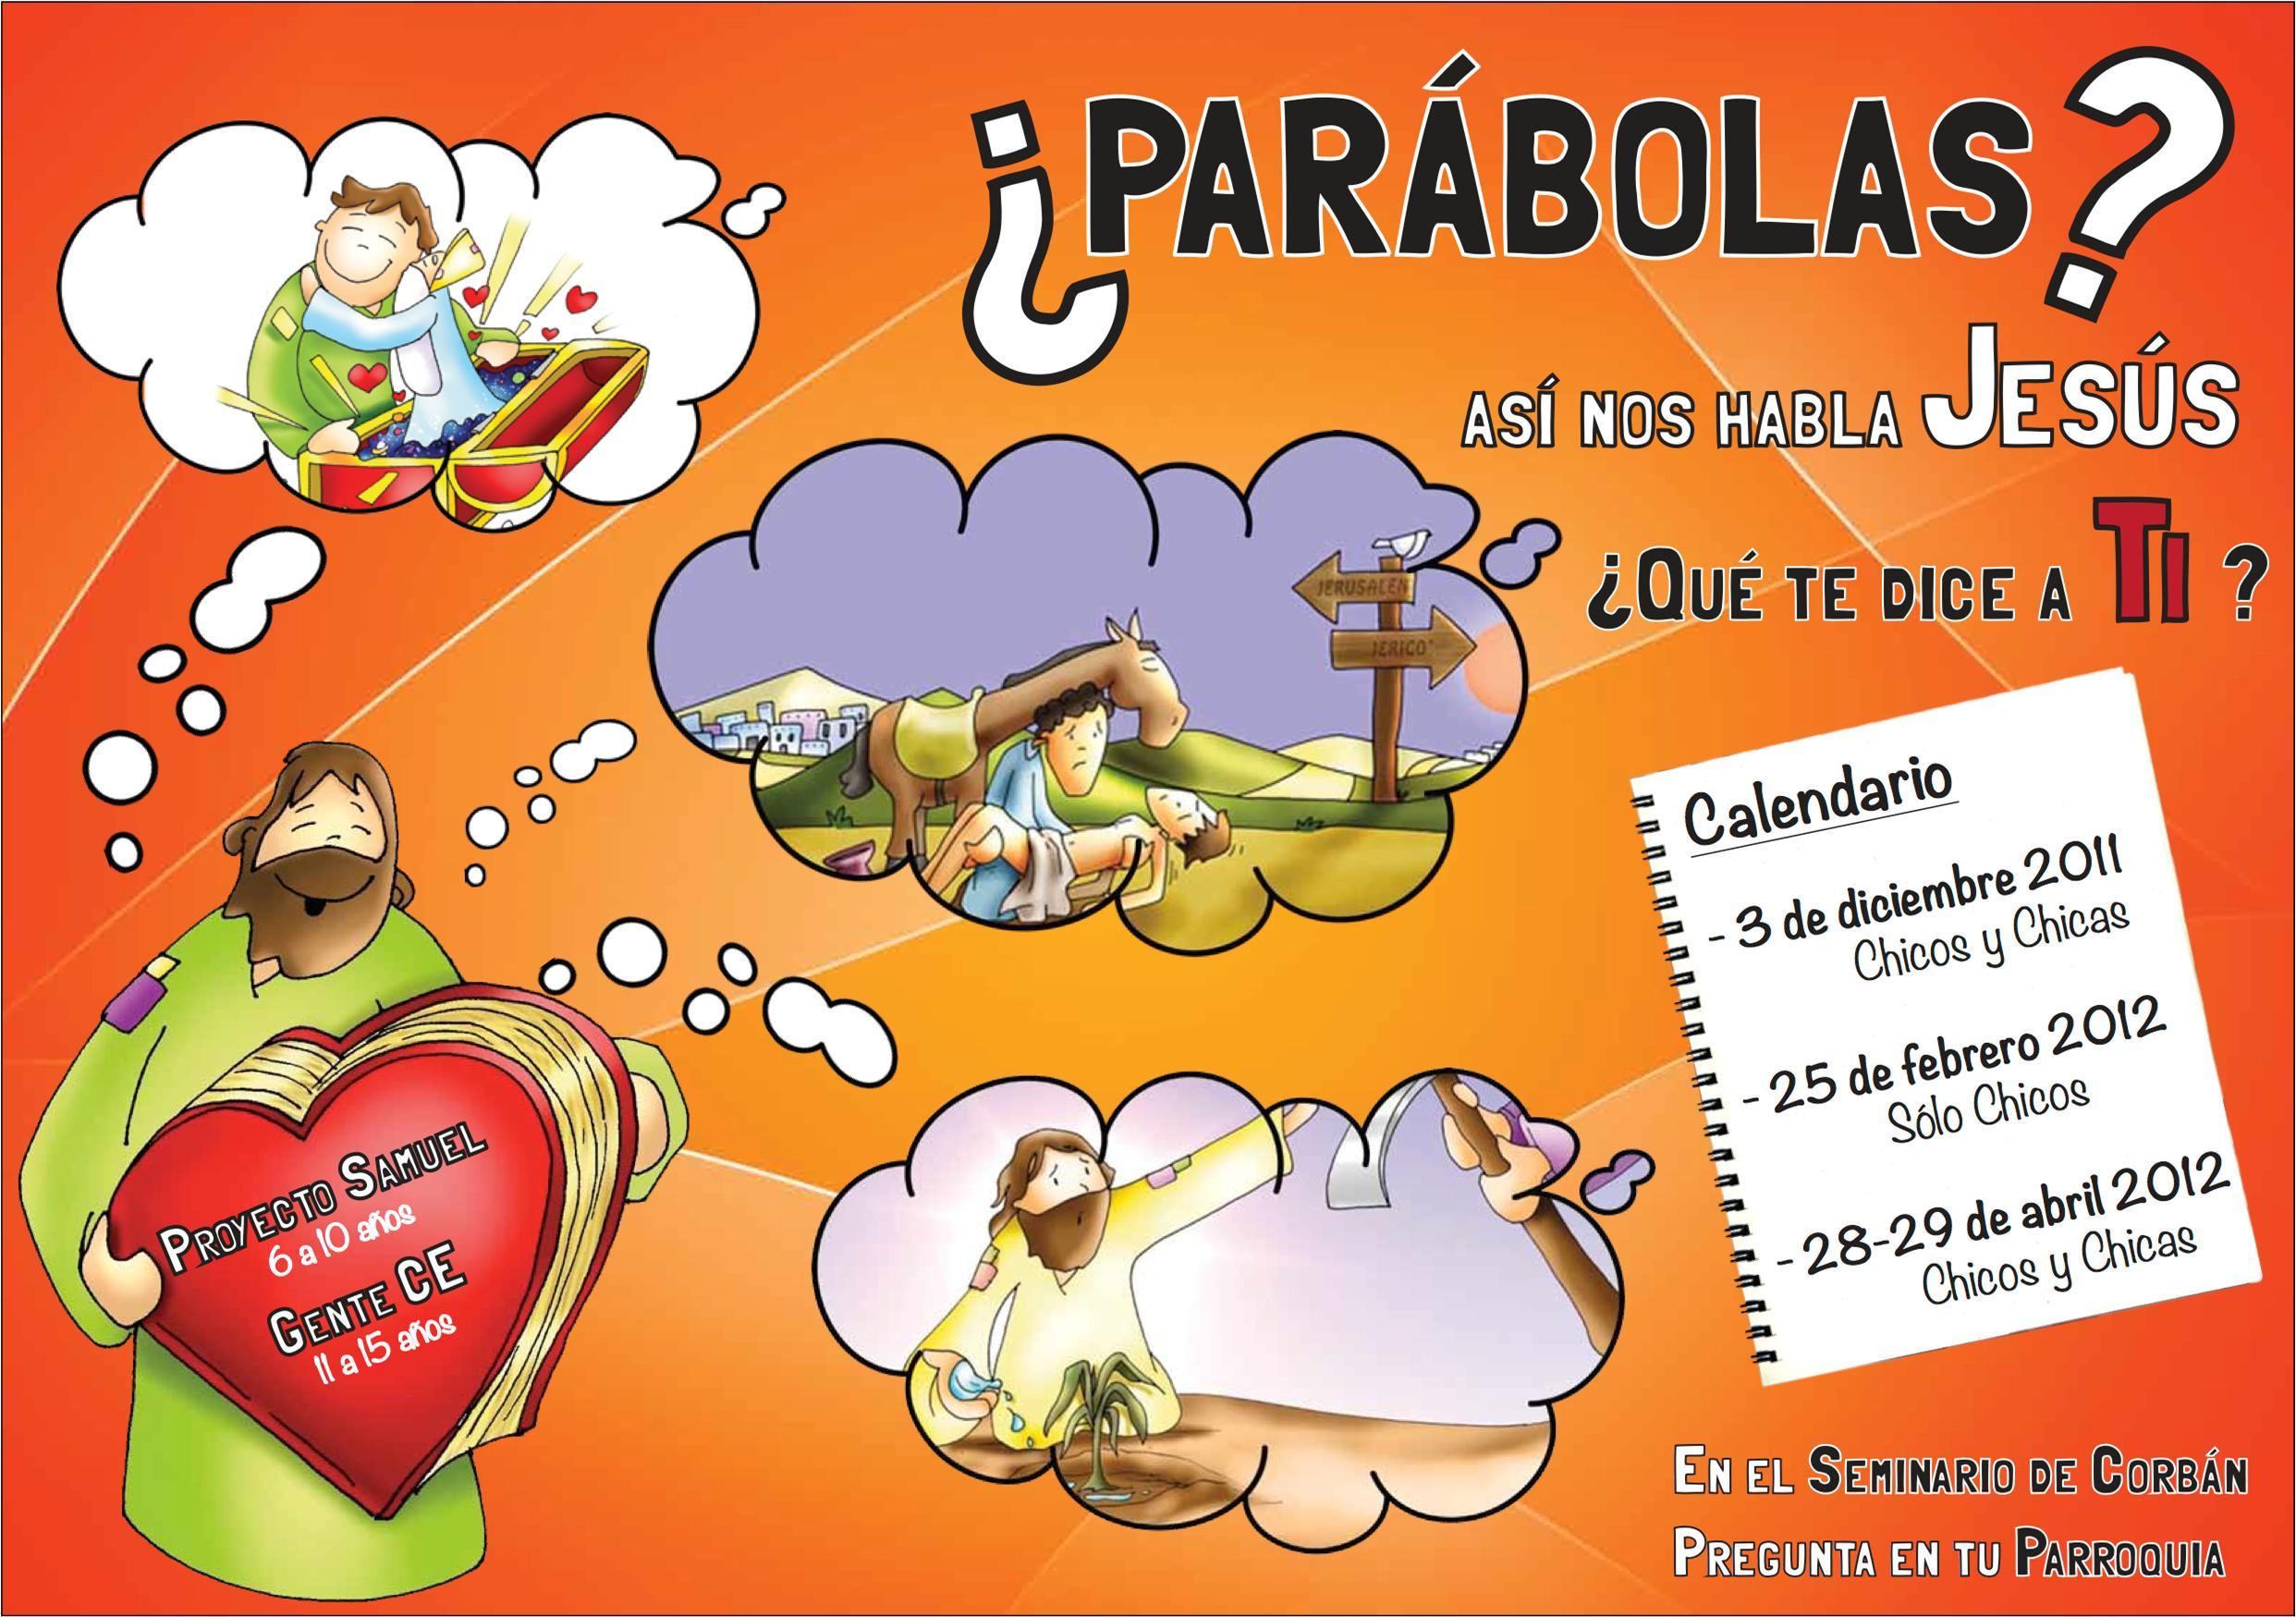 http://www.seminariodecorban.com/wp-content/uploads/2011/10/ProyectoSamuel2011-2012.jpg